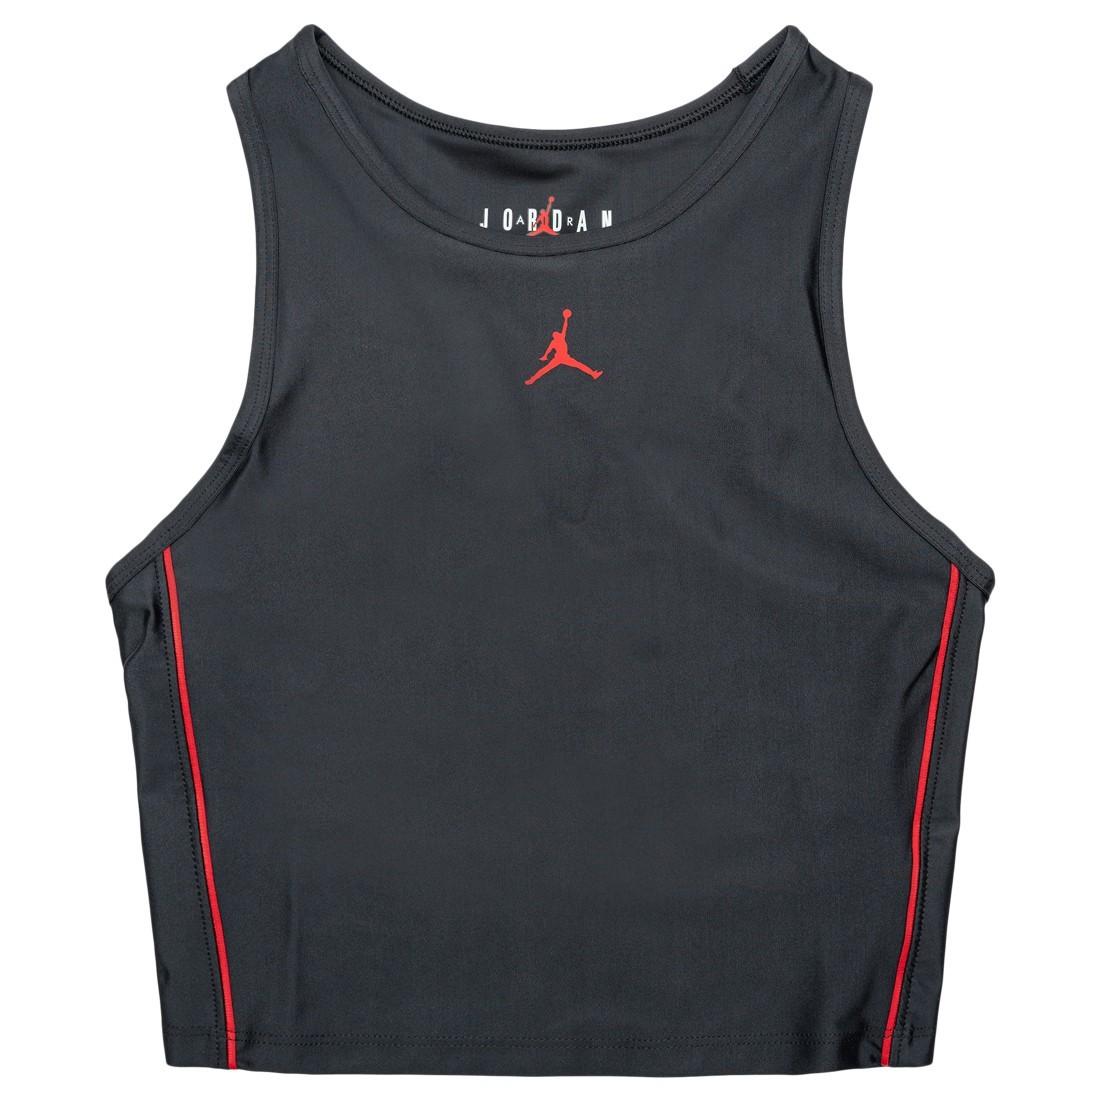 Jordan Women Essential Crop Top (black / black / university red)